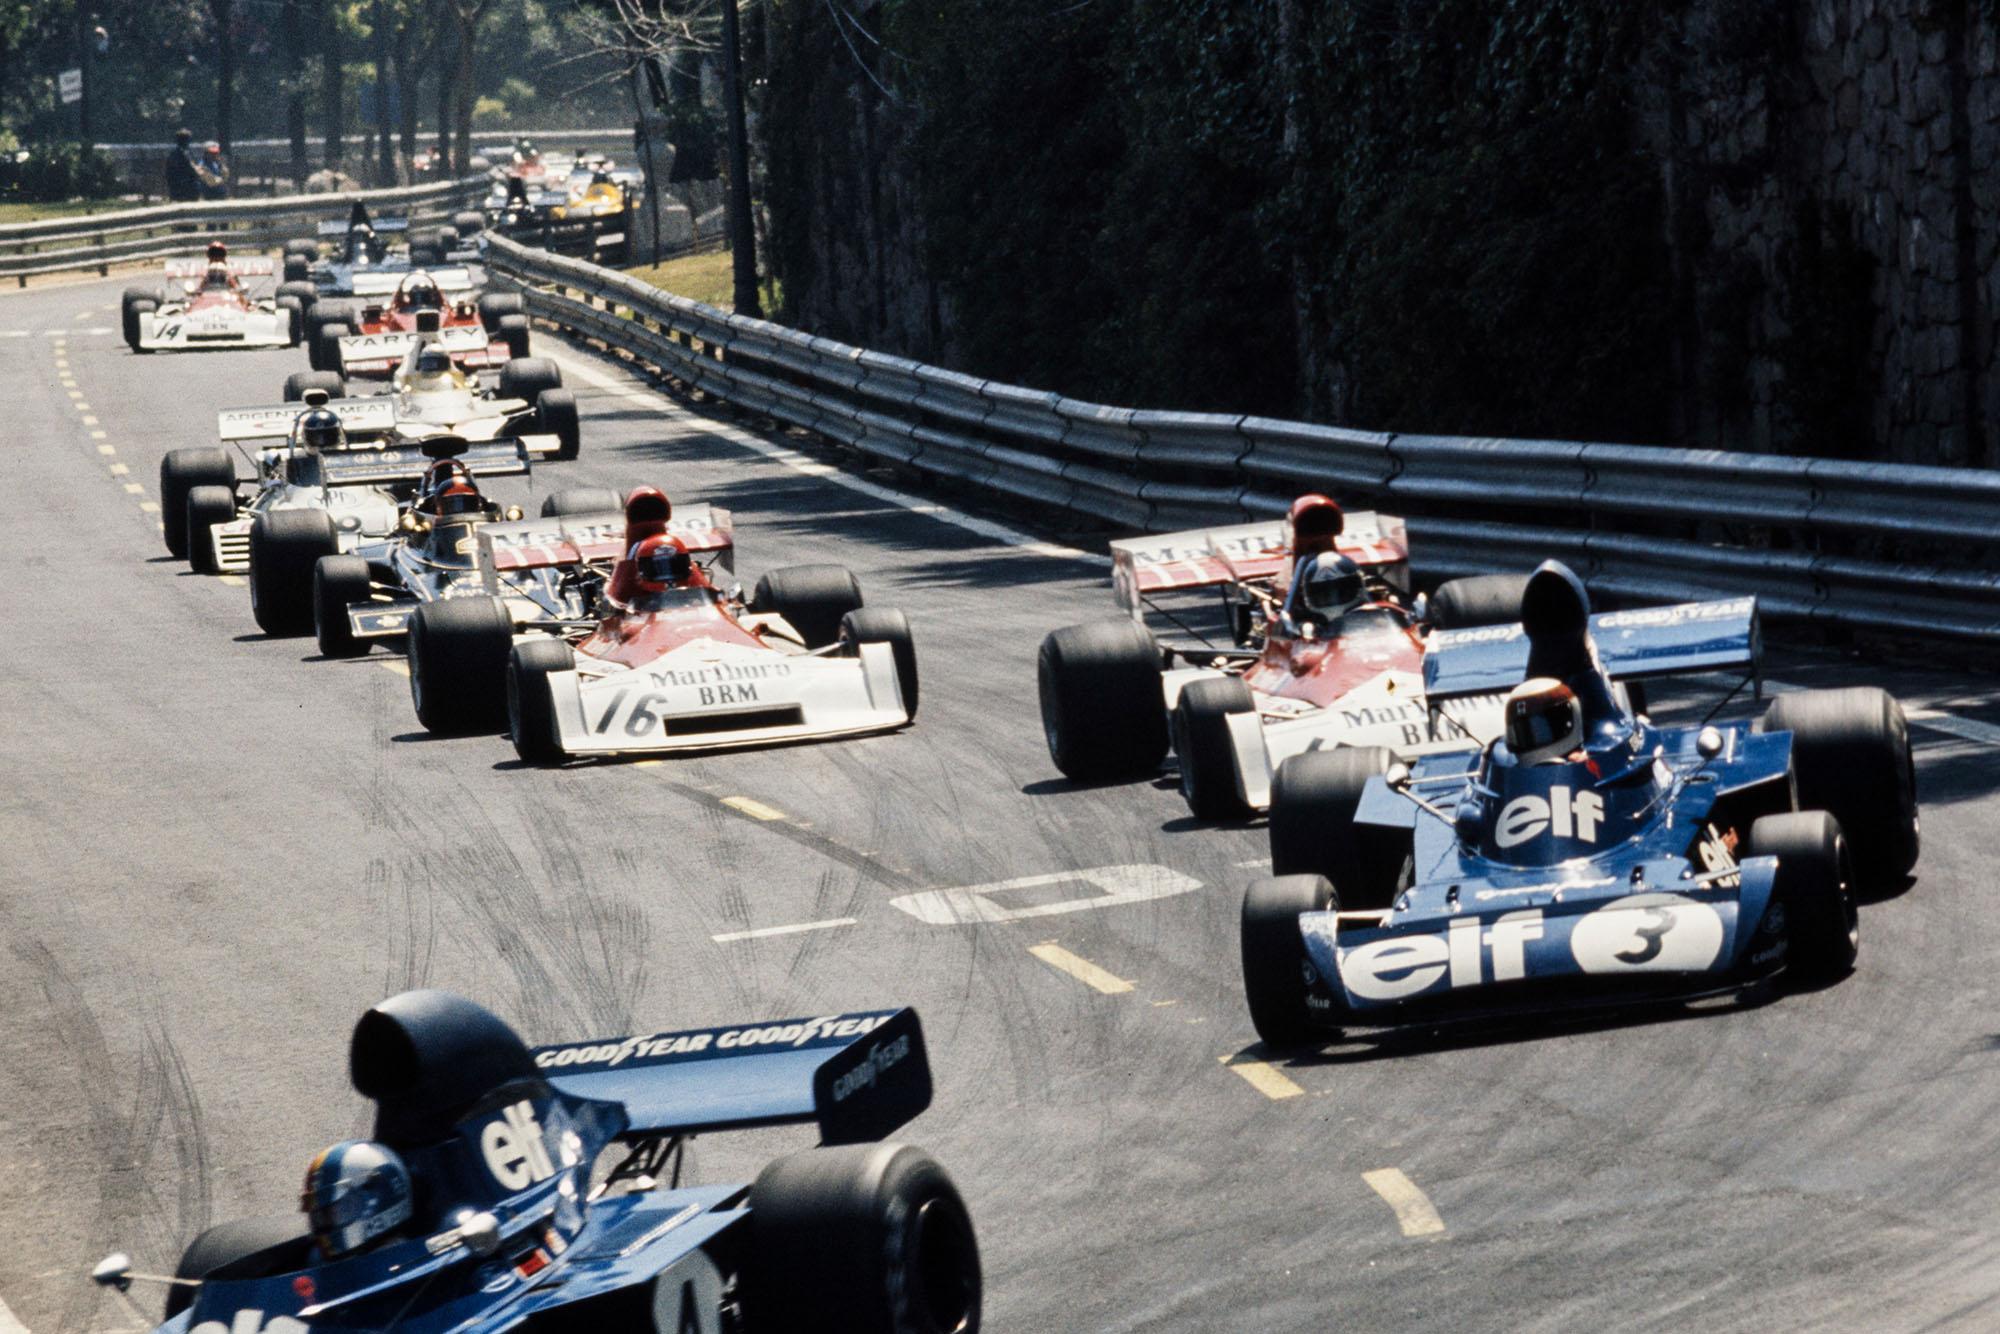 Cars thread through the narrow street circuit of Montjuïch Park at the 1973 Spanish Grand Prix.